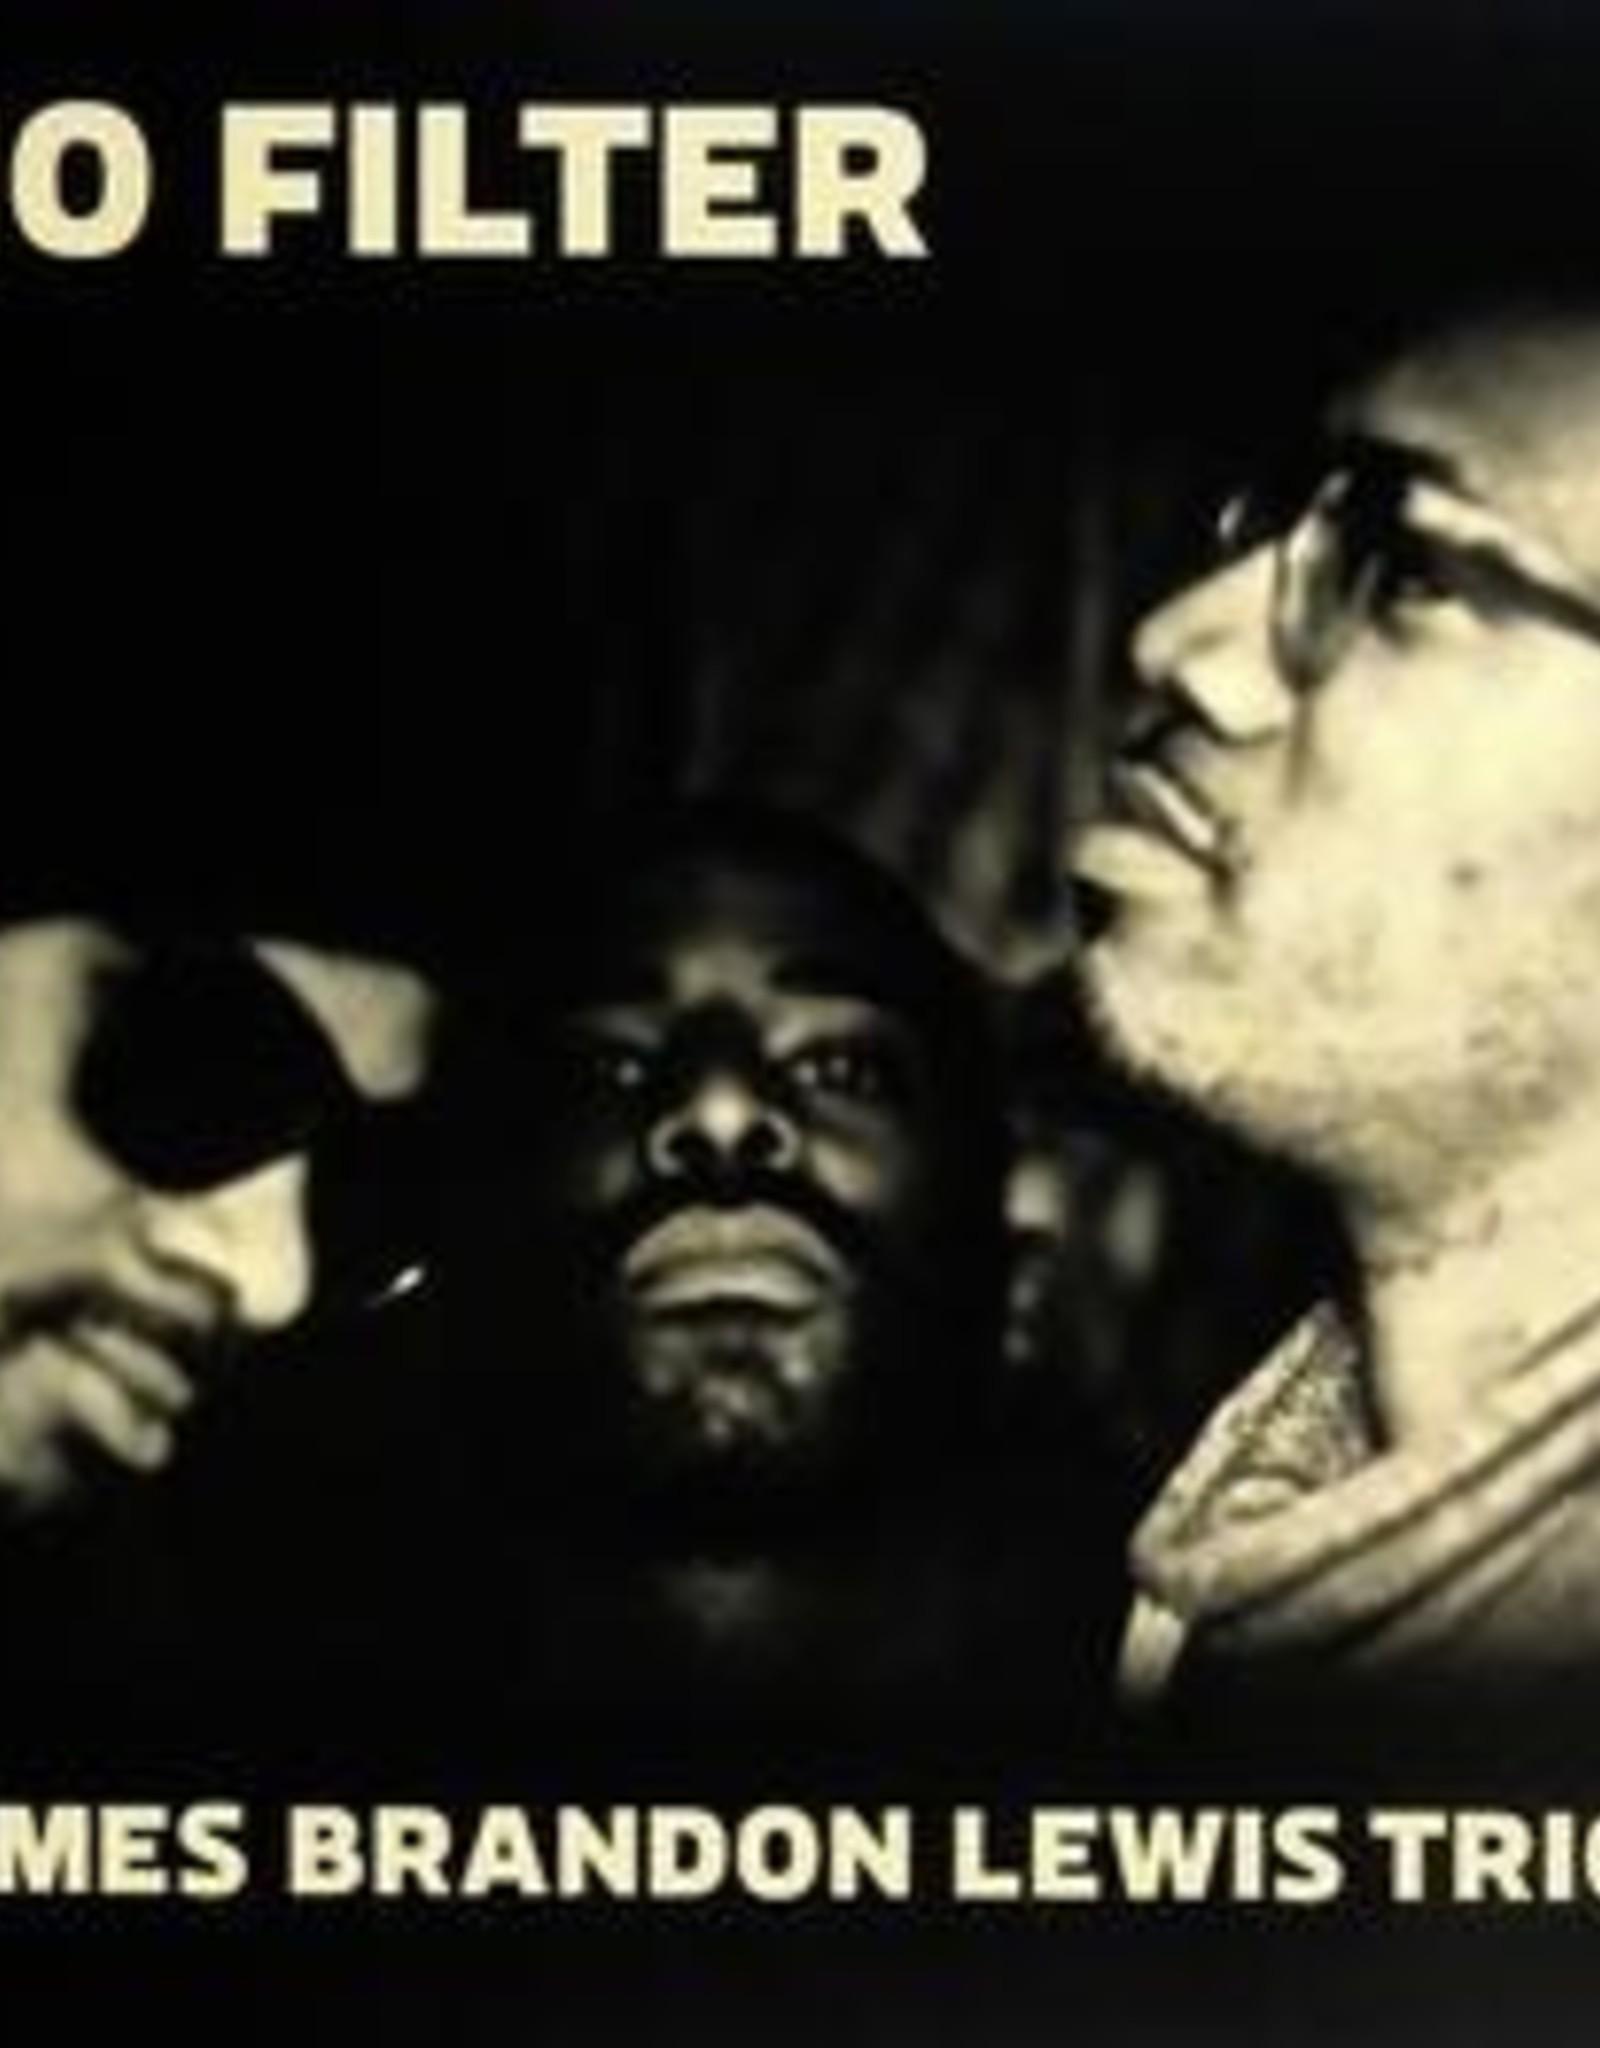 James Brandon Lewis Trio - No Filter